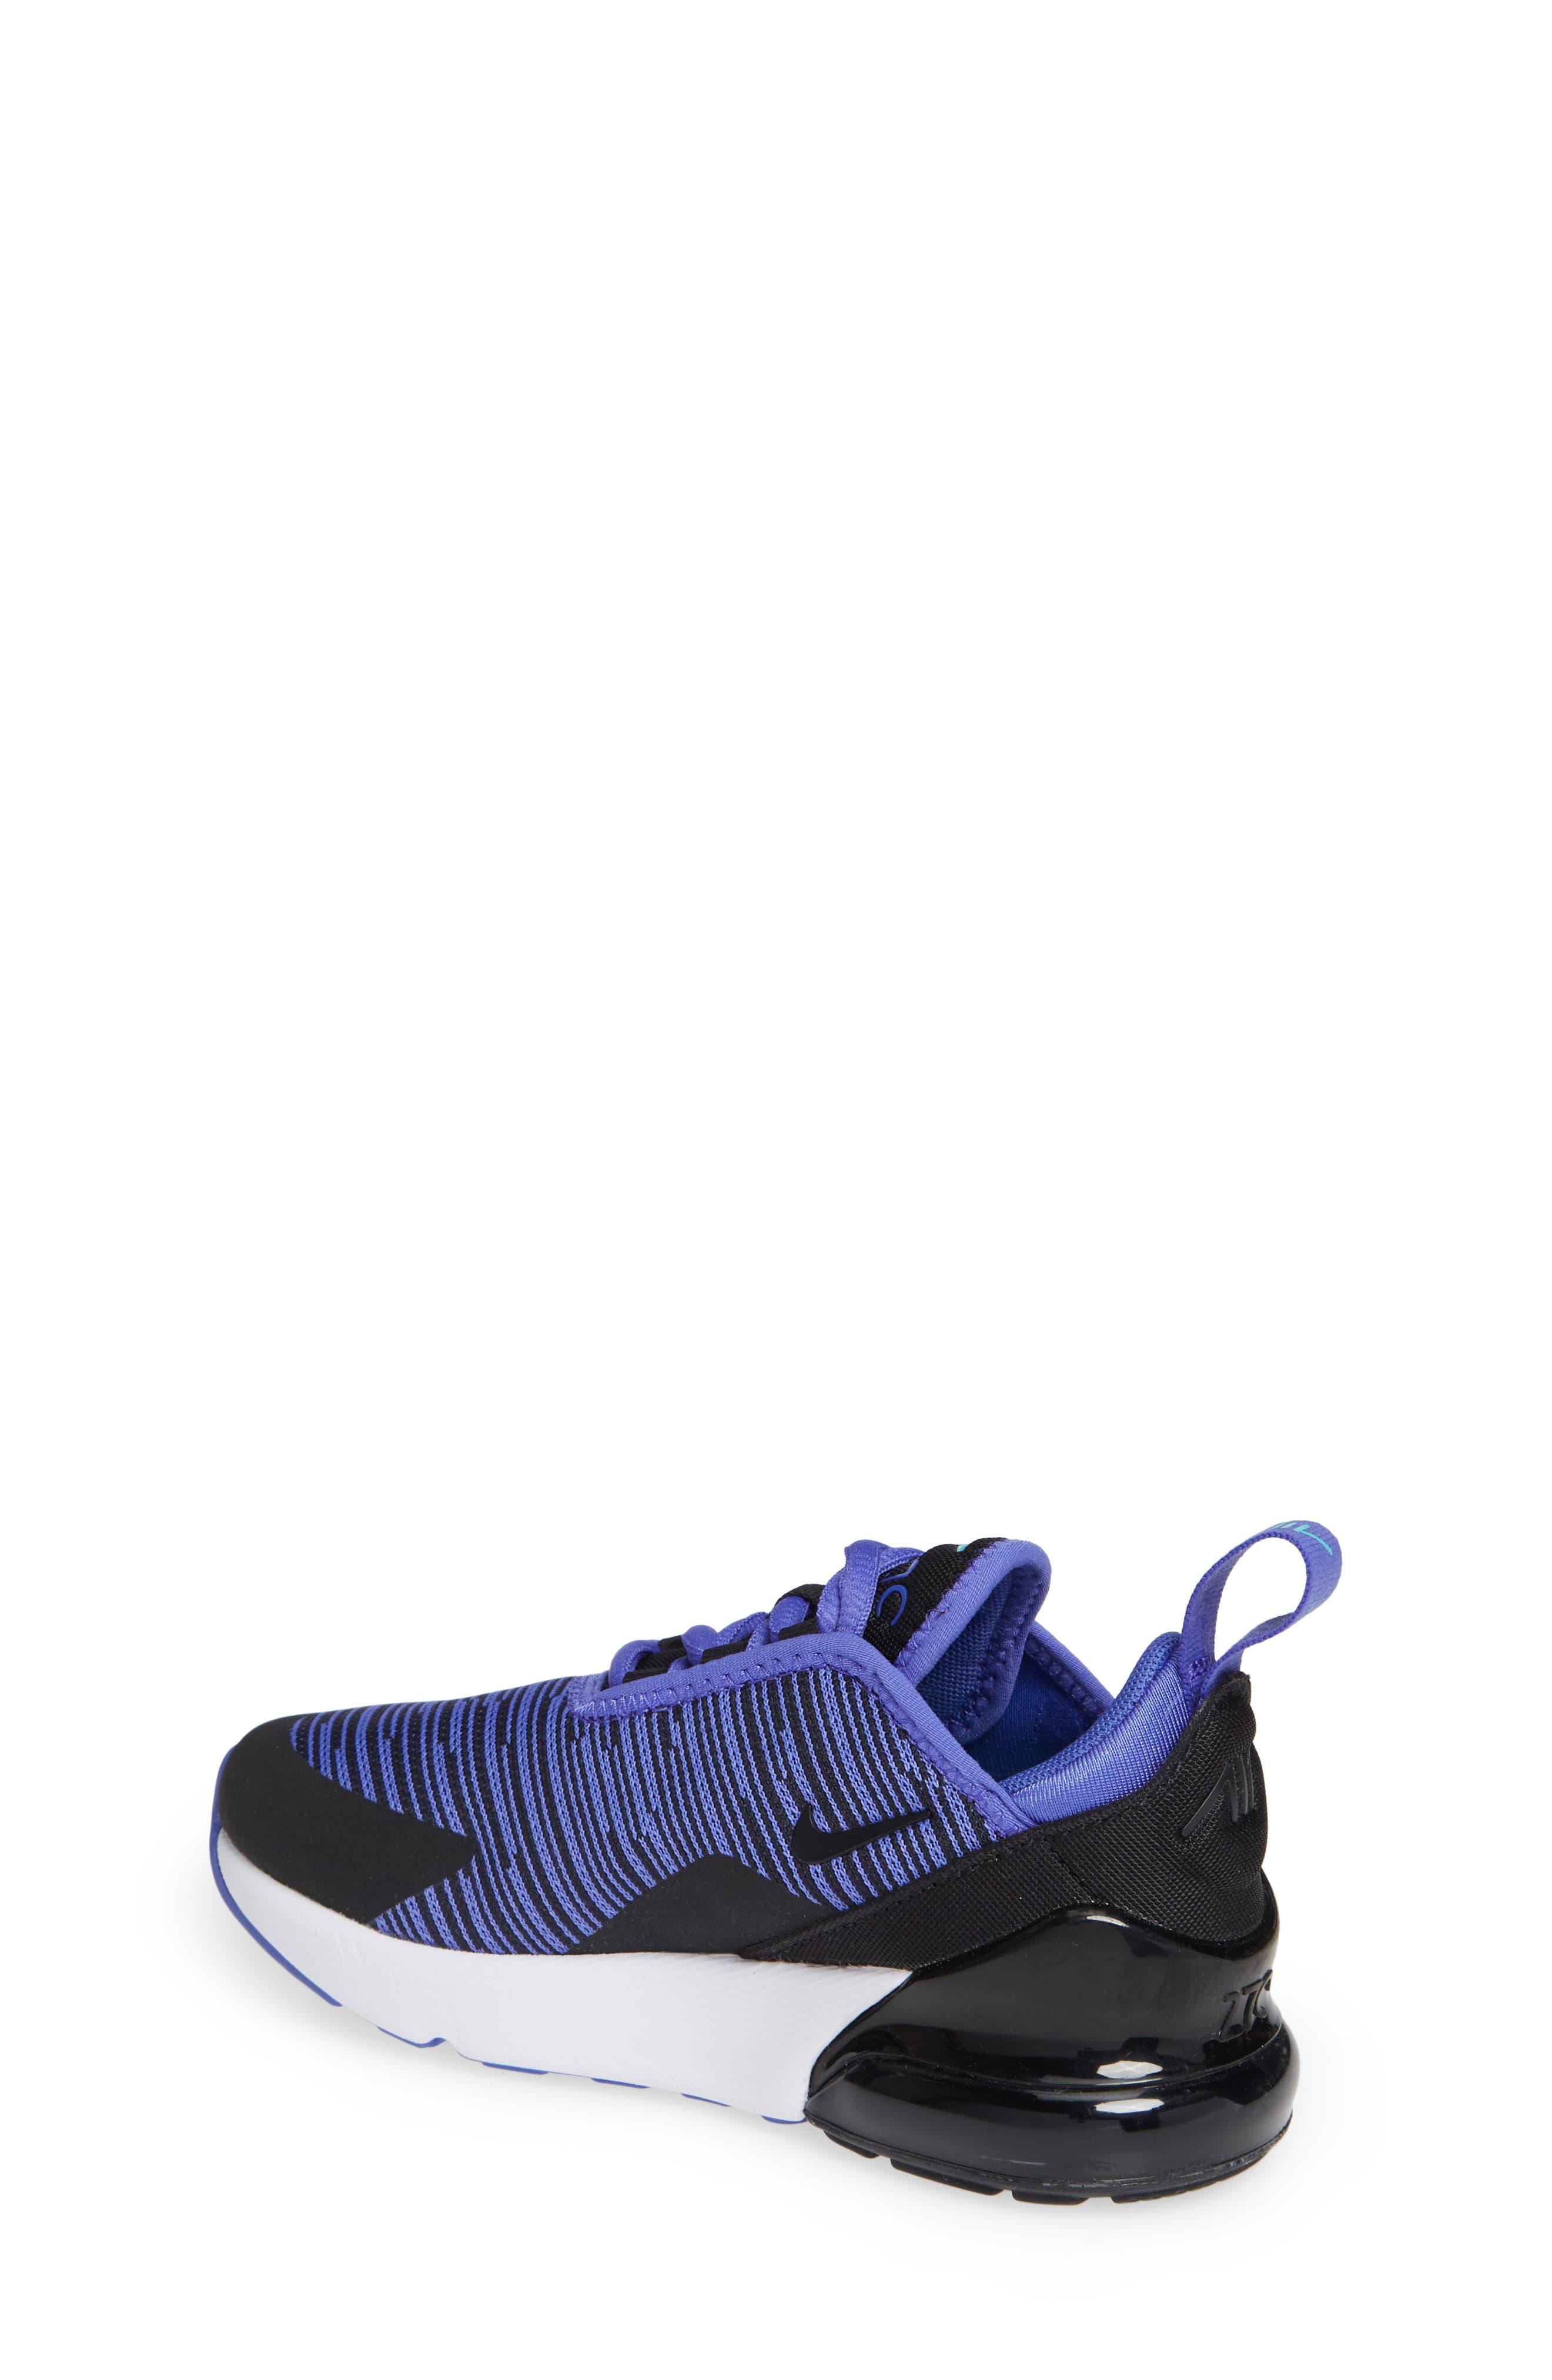 d8d188c4bd80 ... flyknit 2 running shoes d5c4a e4031  switzerland little girls nike  shoes sizes 12.5 3 nordstrom 3c4bb 34721